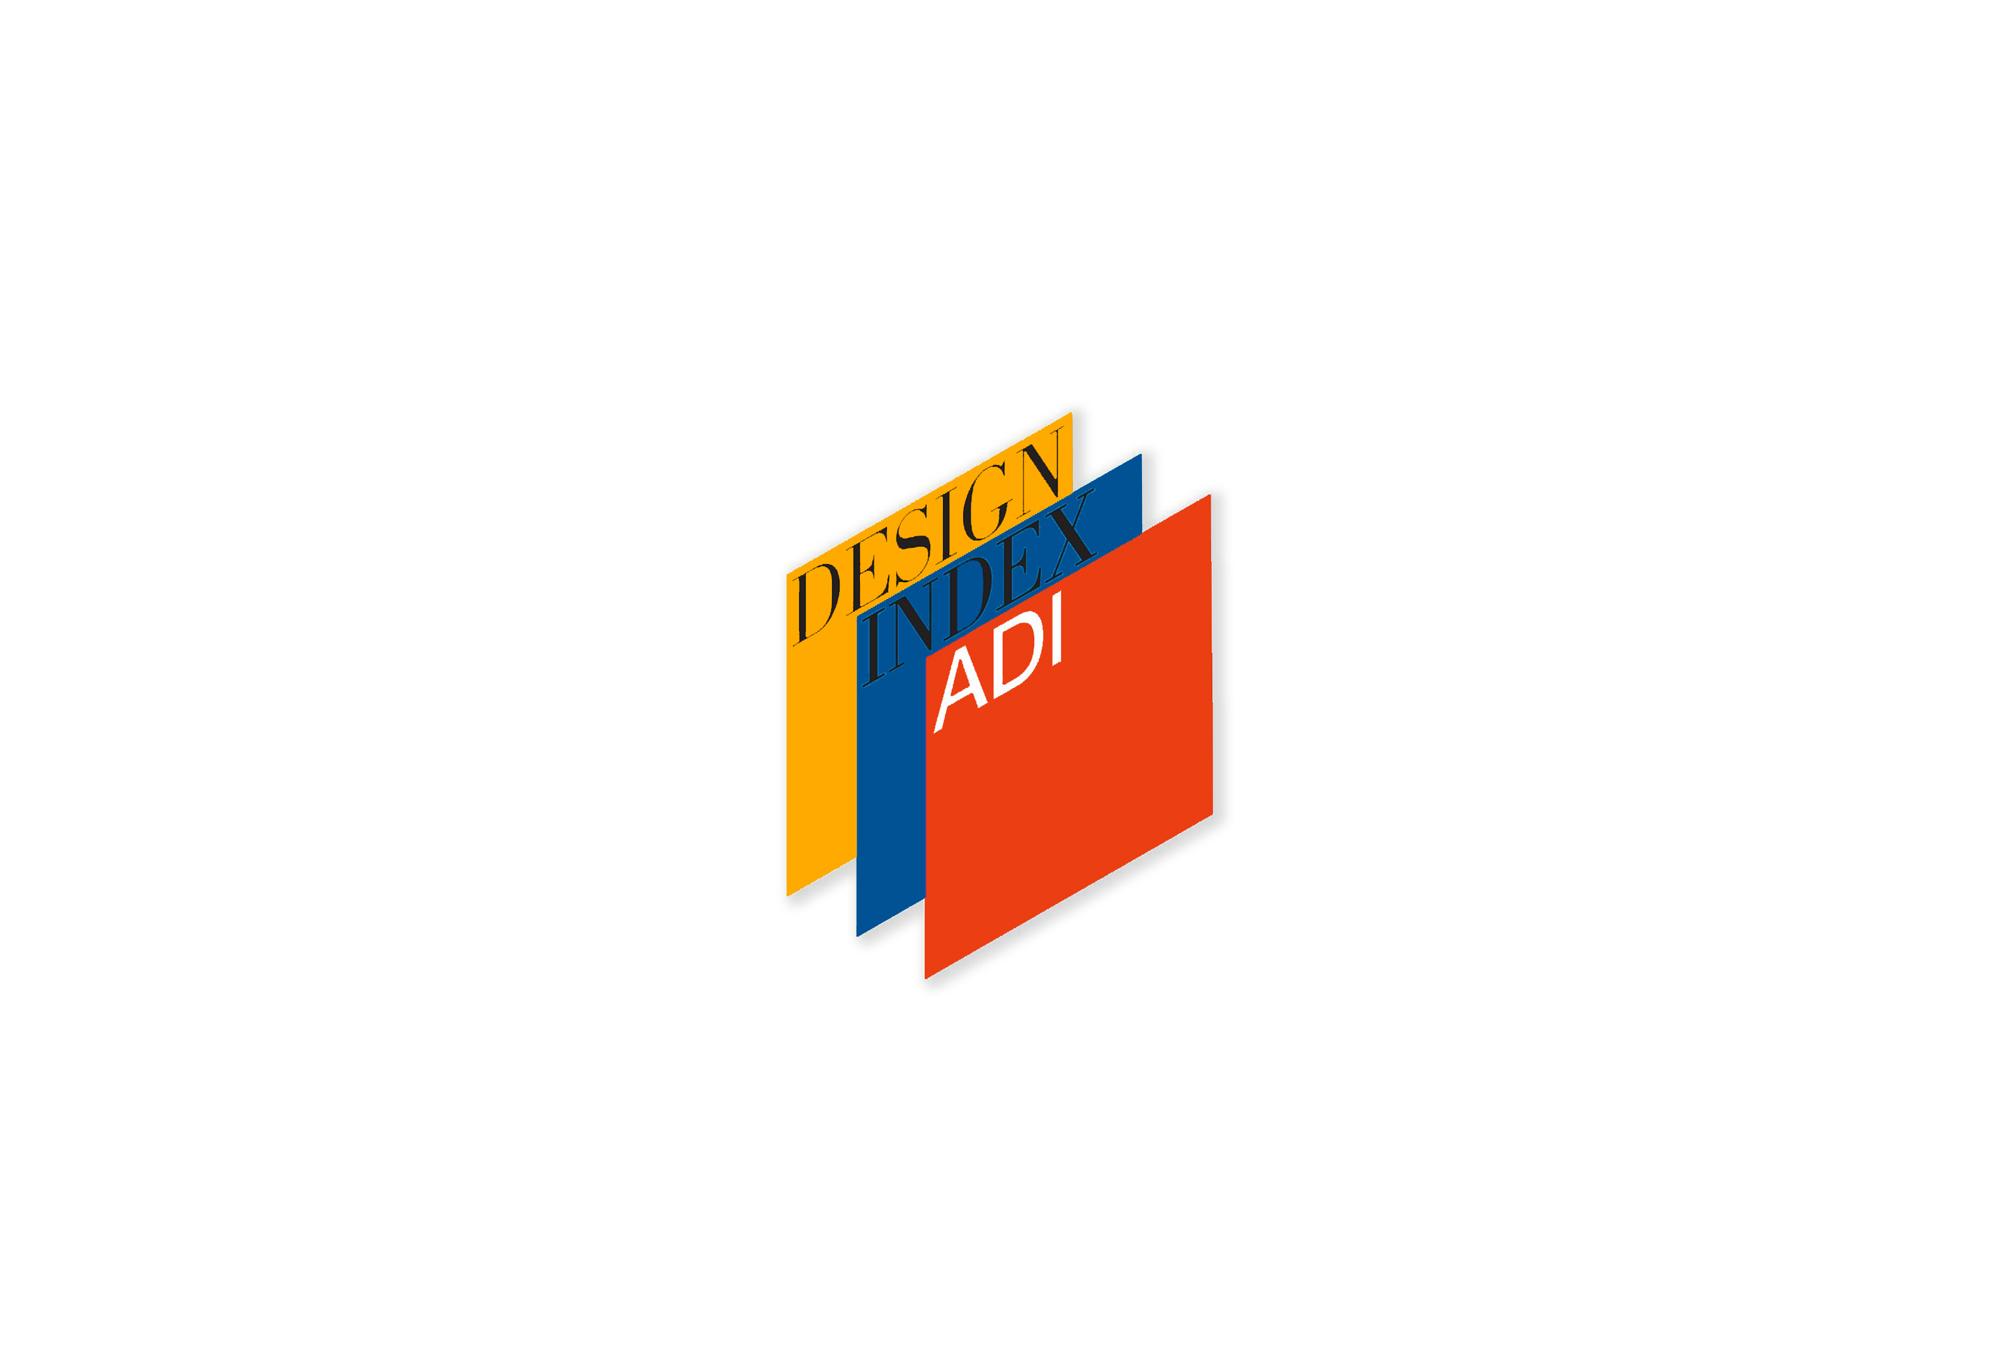 Prix pour l'Innovation ADI Design Index 2017